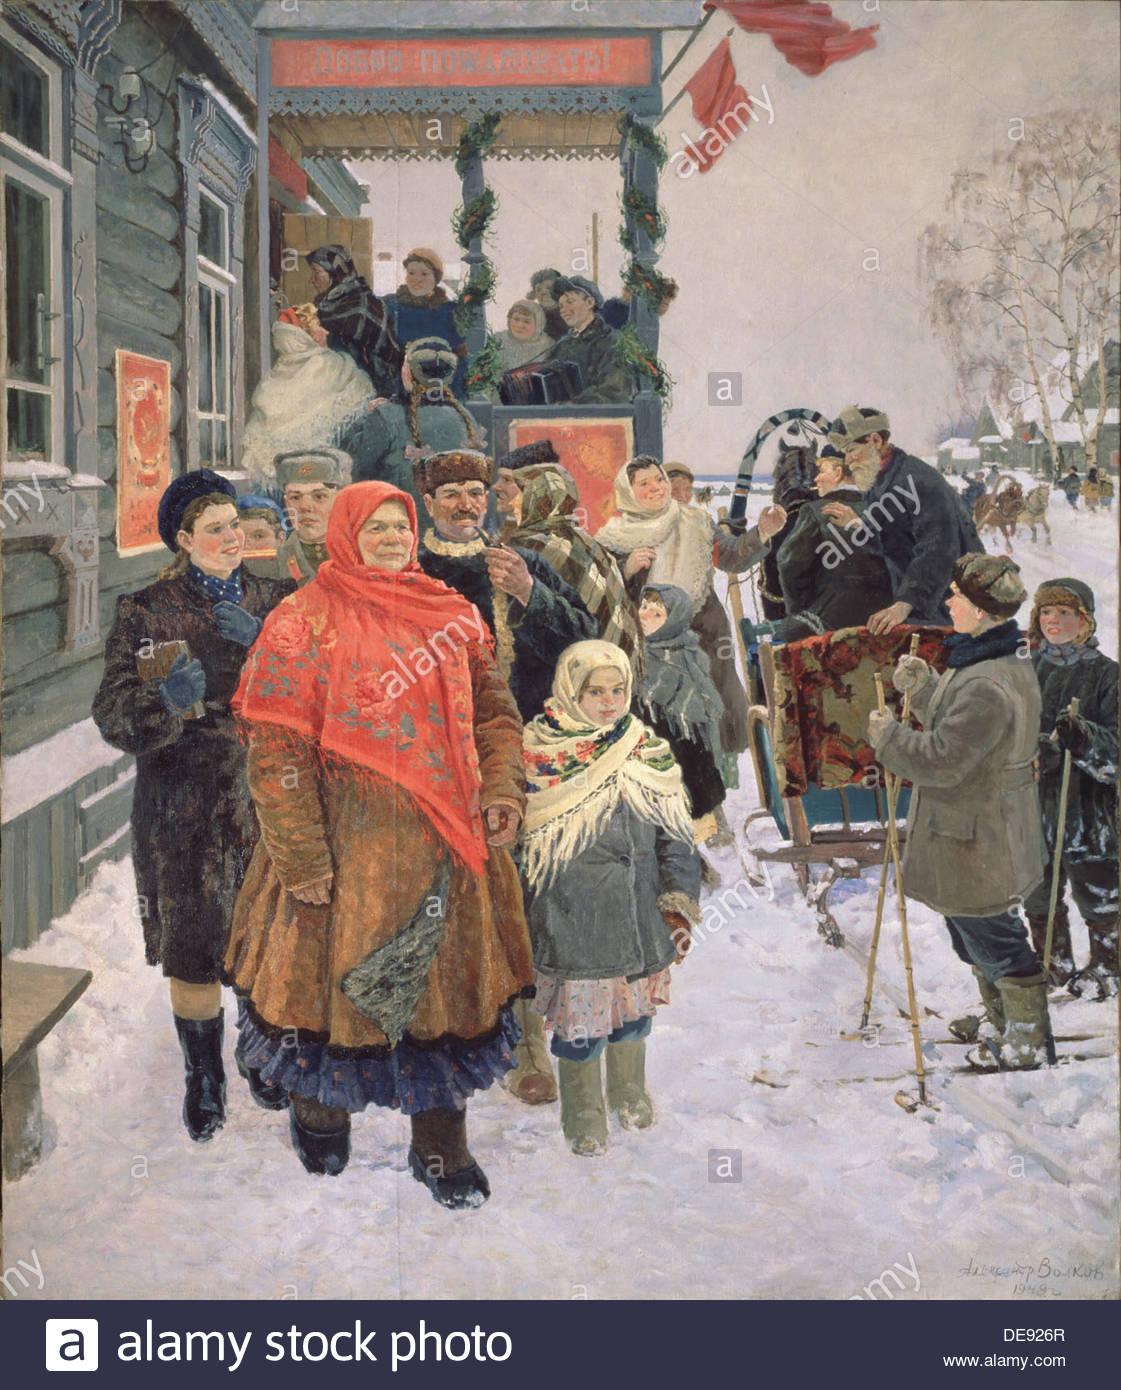 The Election to the Supreme Soviet Soviet of the USSR, 1949. Artist: Volkov, Alexander Vasilyevich (1916-1978) - Stock Image